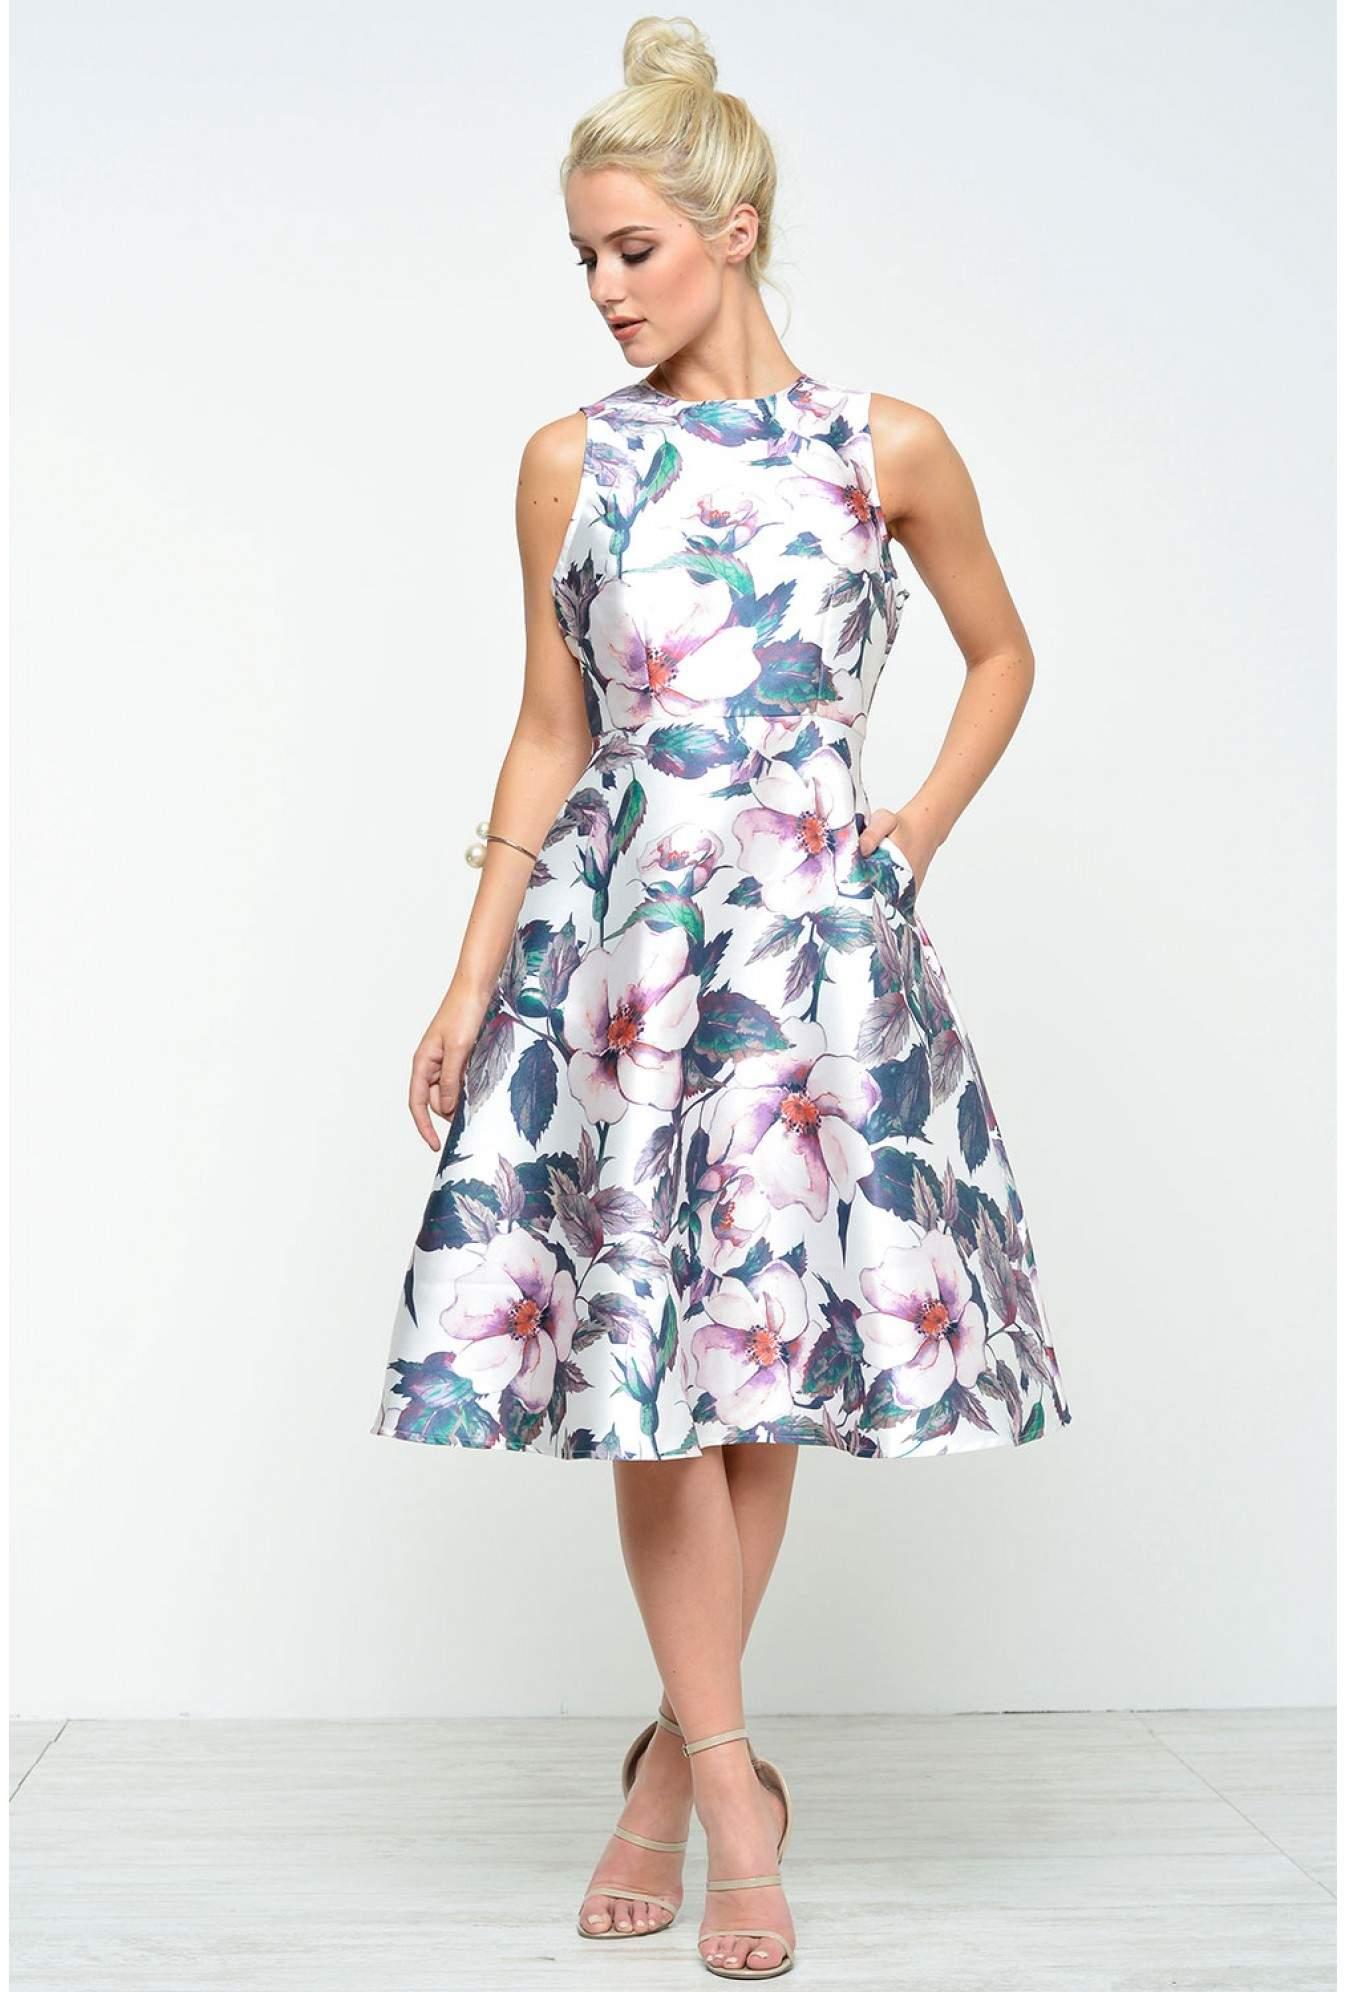 476e5515c1d0c8 Floral Printed Midi Skater Dress Ax Paris